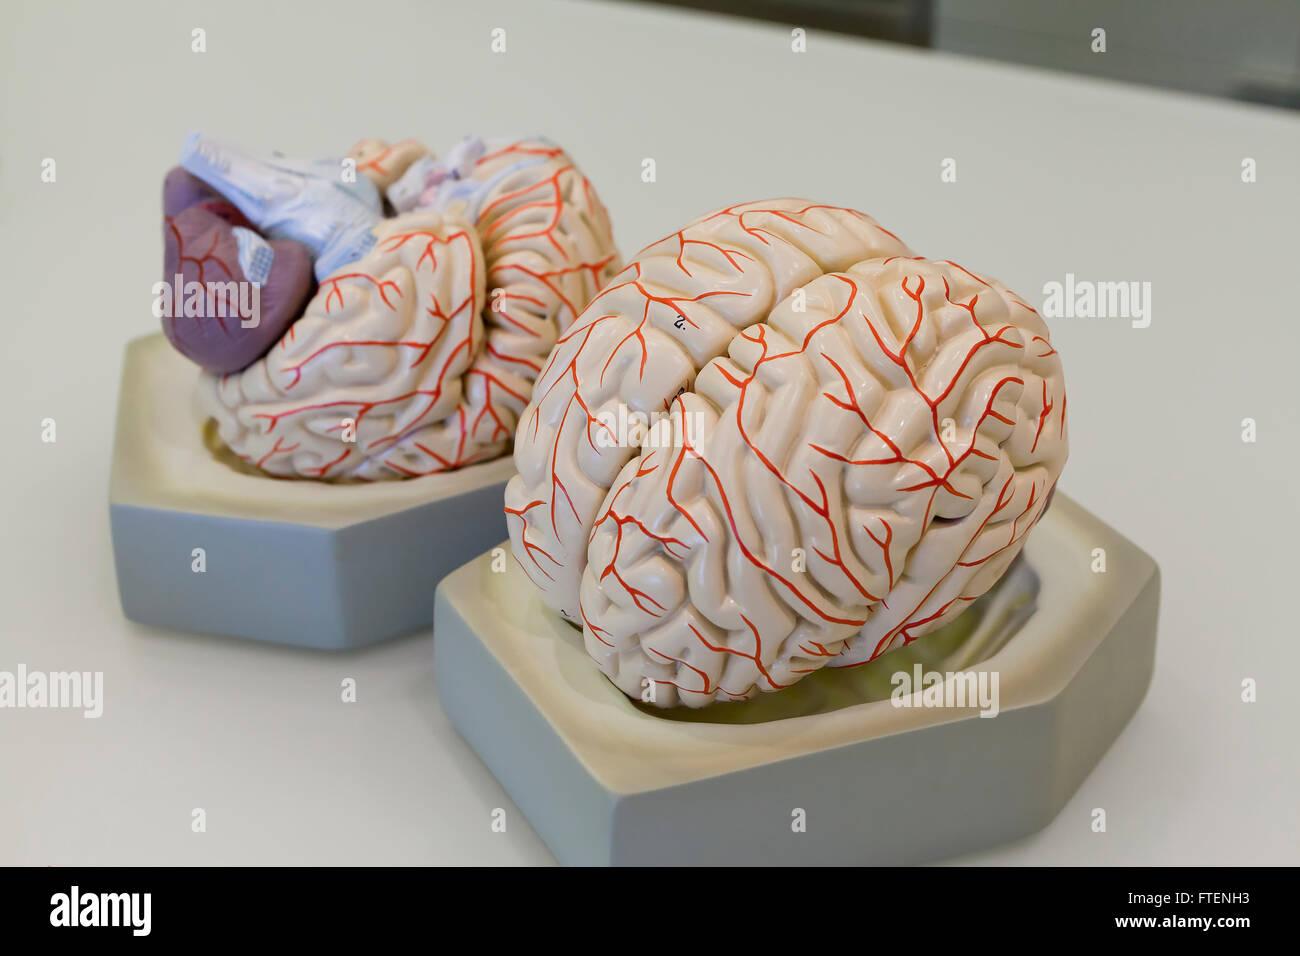 Human brain model - USA - Stock Image